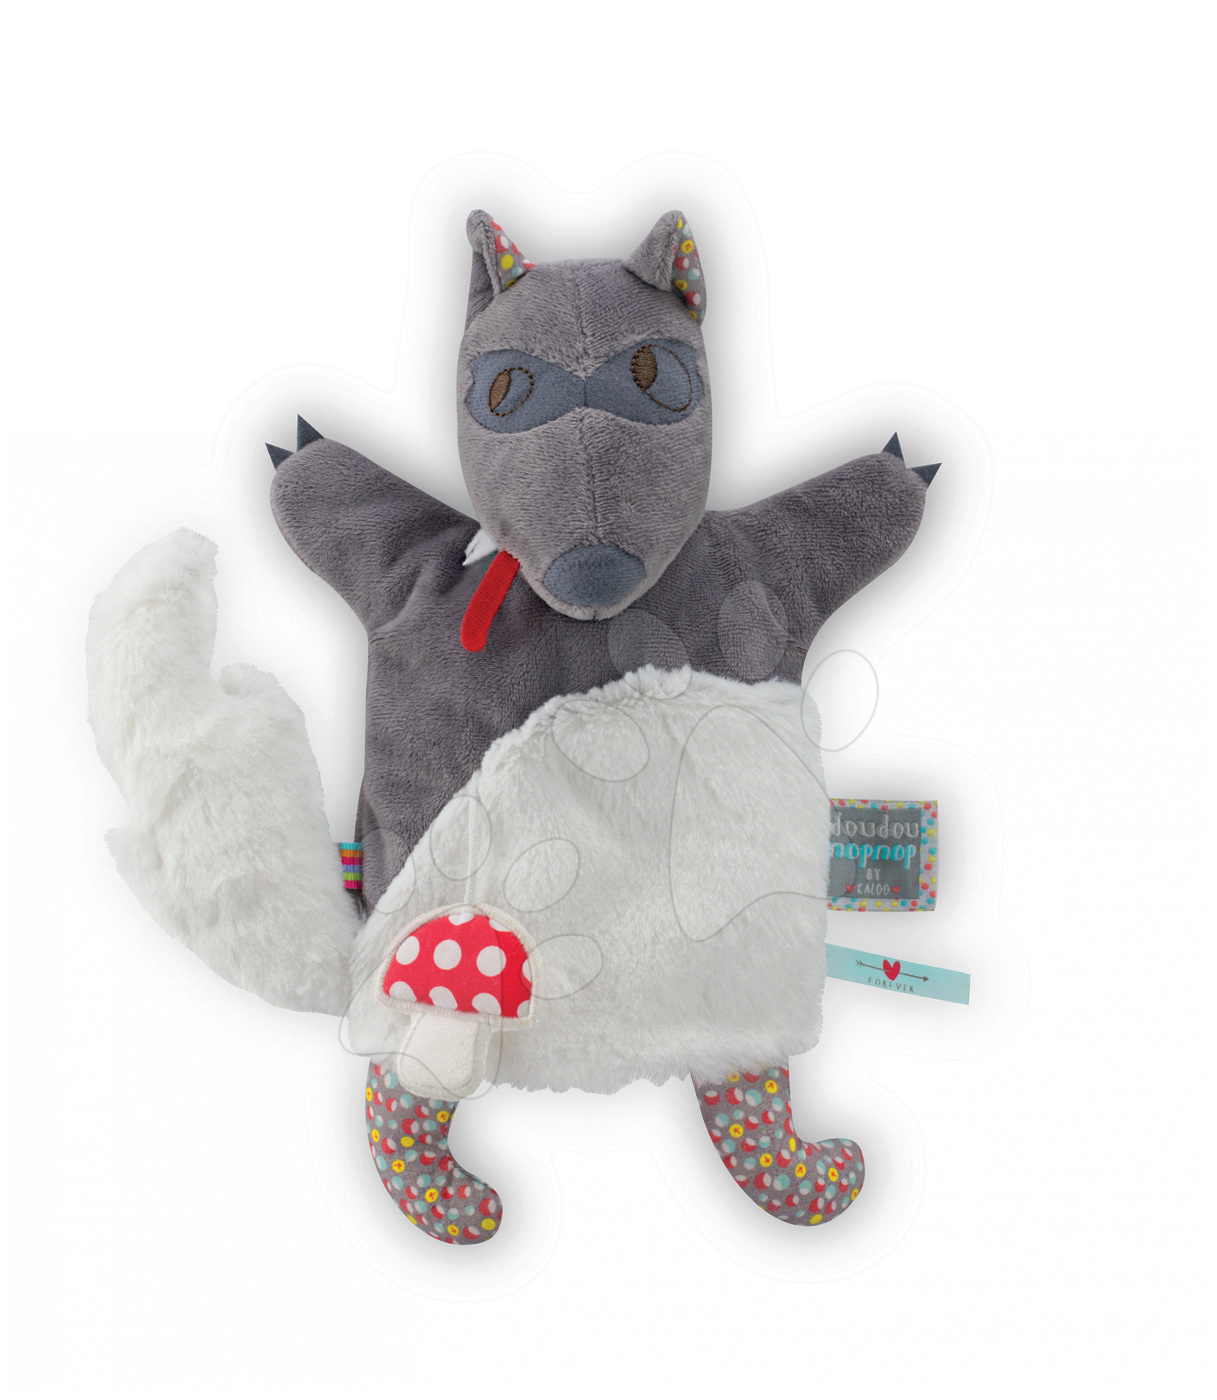 Bábky pre najmenších - Plyšový vlk bábkové divadlo Nopnop-Loup Wolf Doudou Kaloo 25 cm pre najmenších